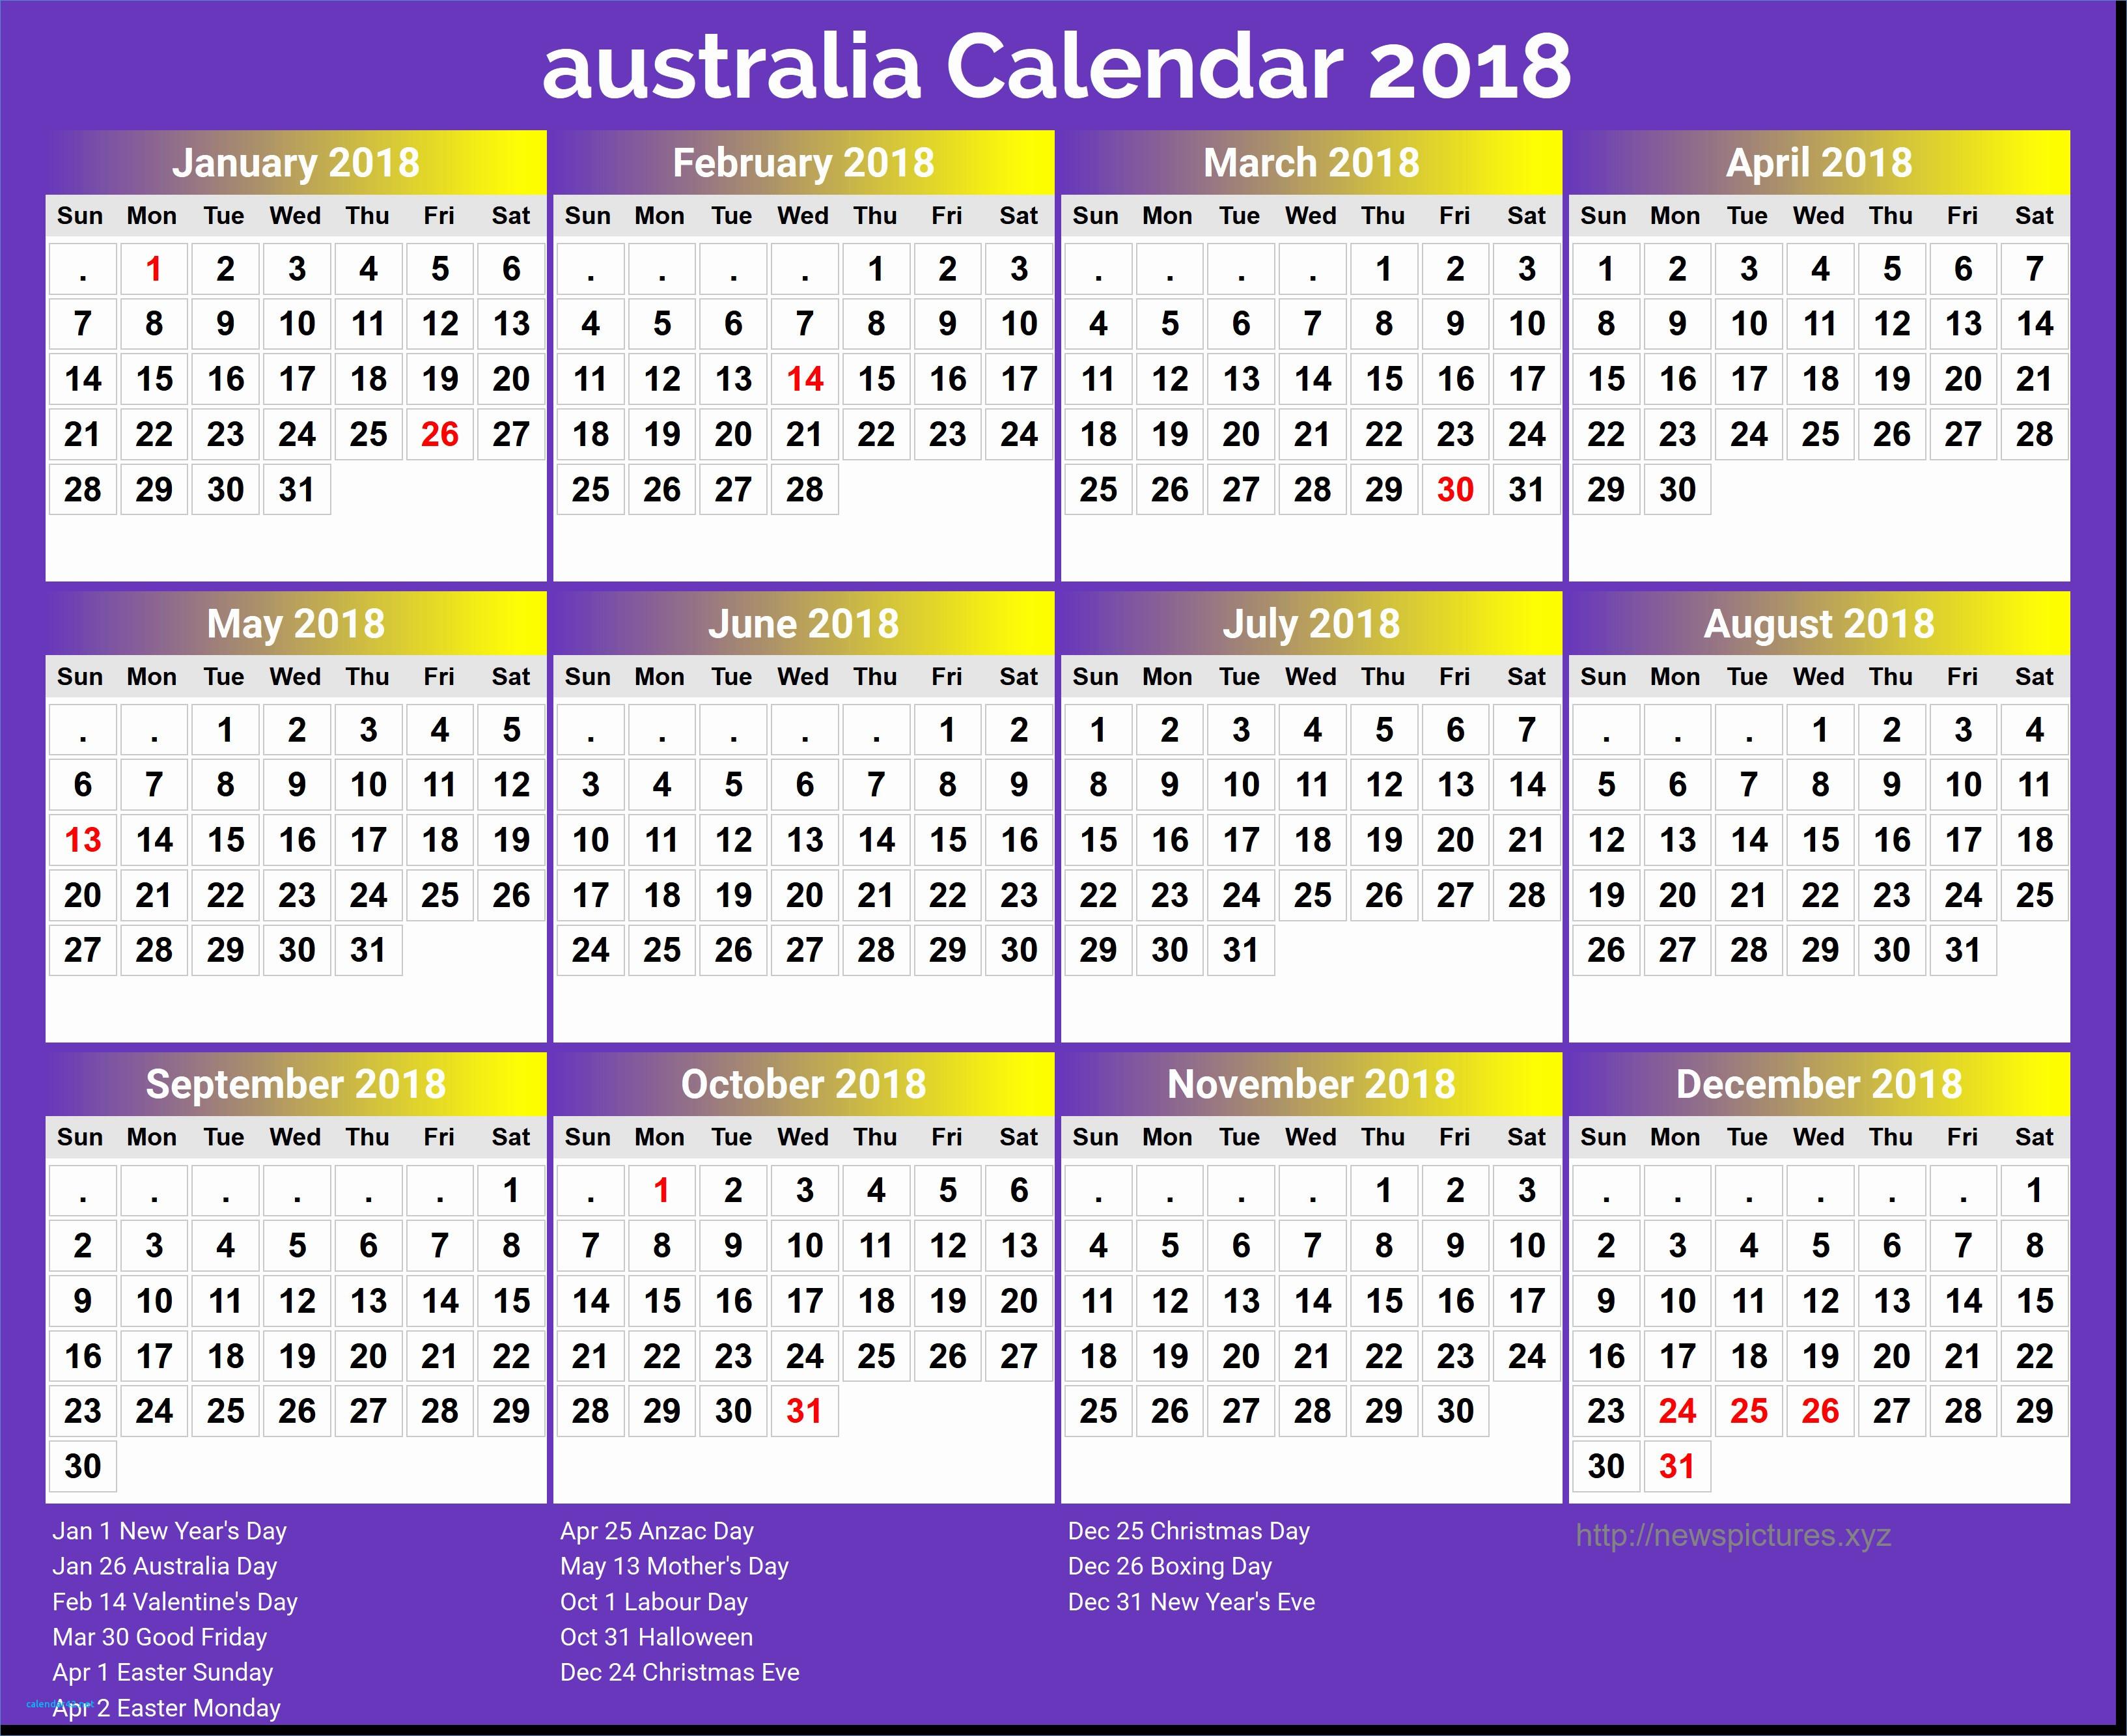 Free Printable Yearly Calendar 2018 Elegant Luxury Free Printable Yearly Calendar 2018 with Holidays